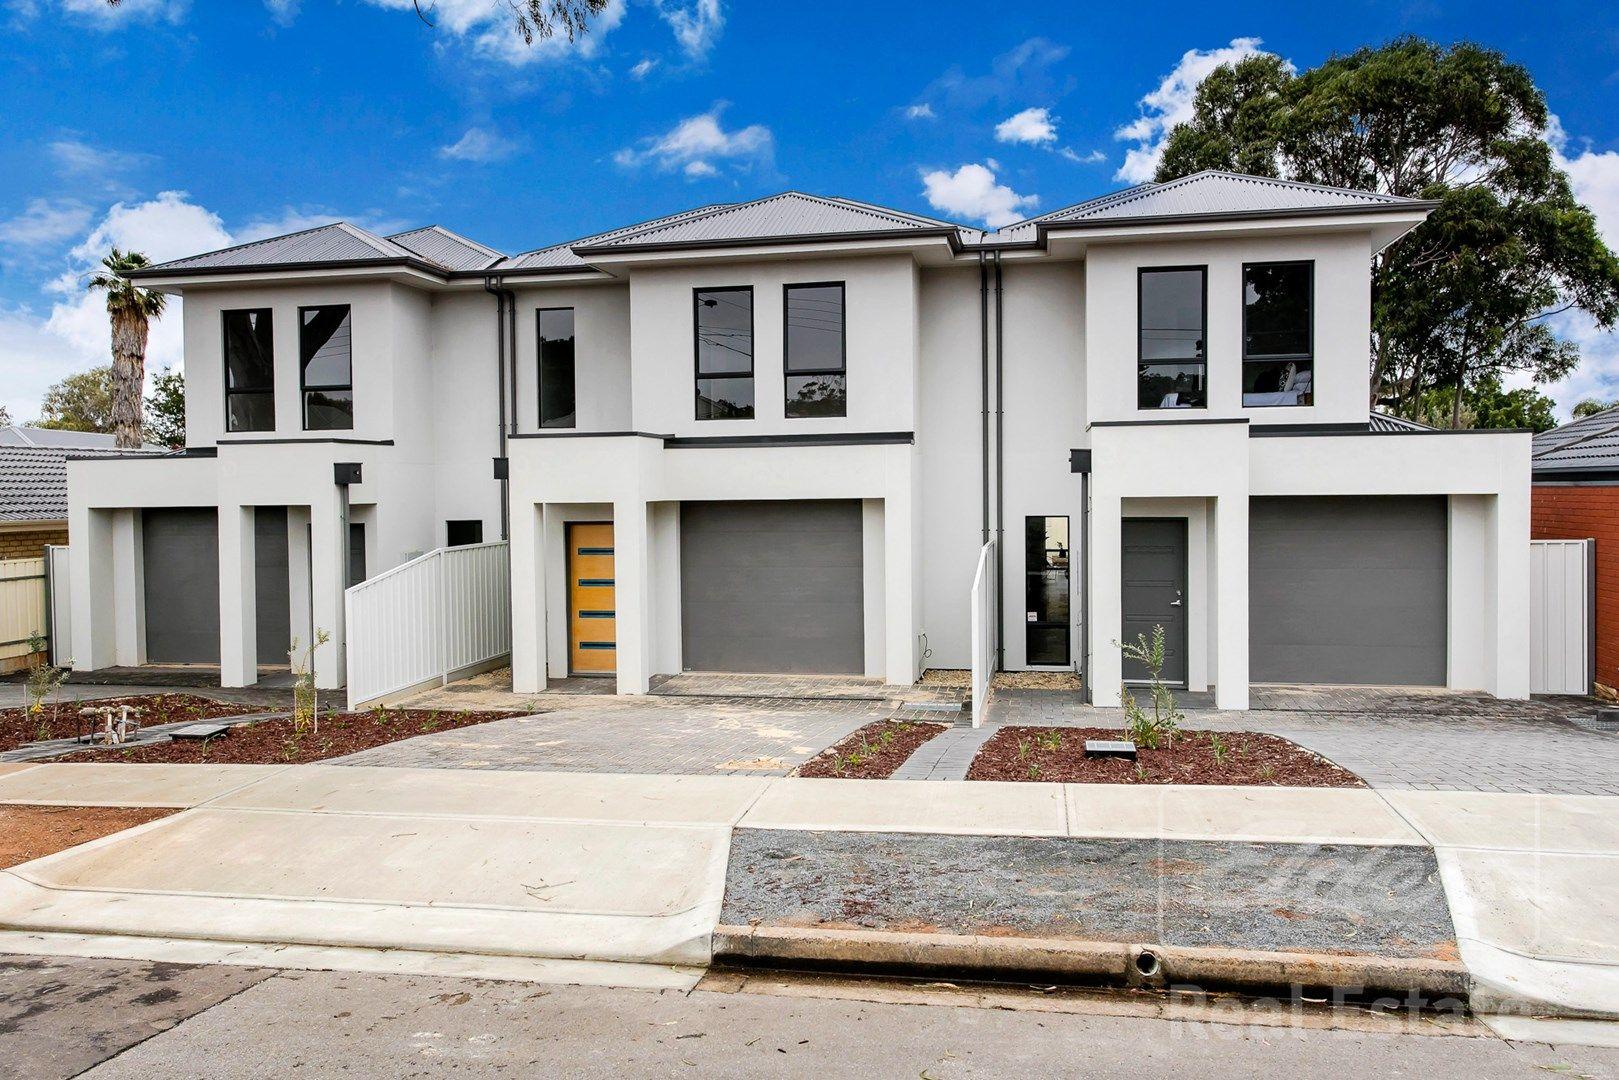 9, 9A & 9B Vardon Street, Seacombe Gardens SA 5047, Image 0